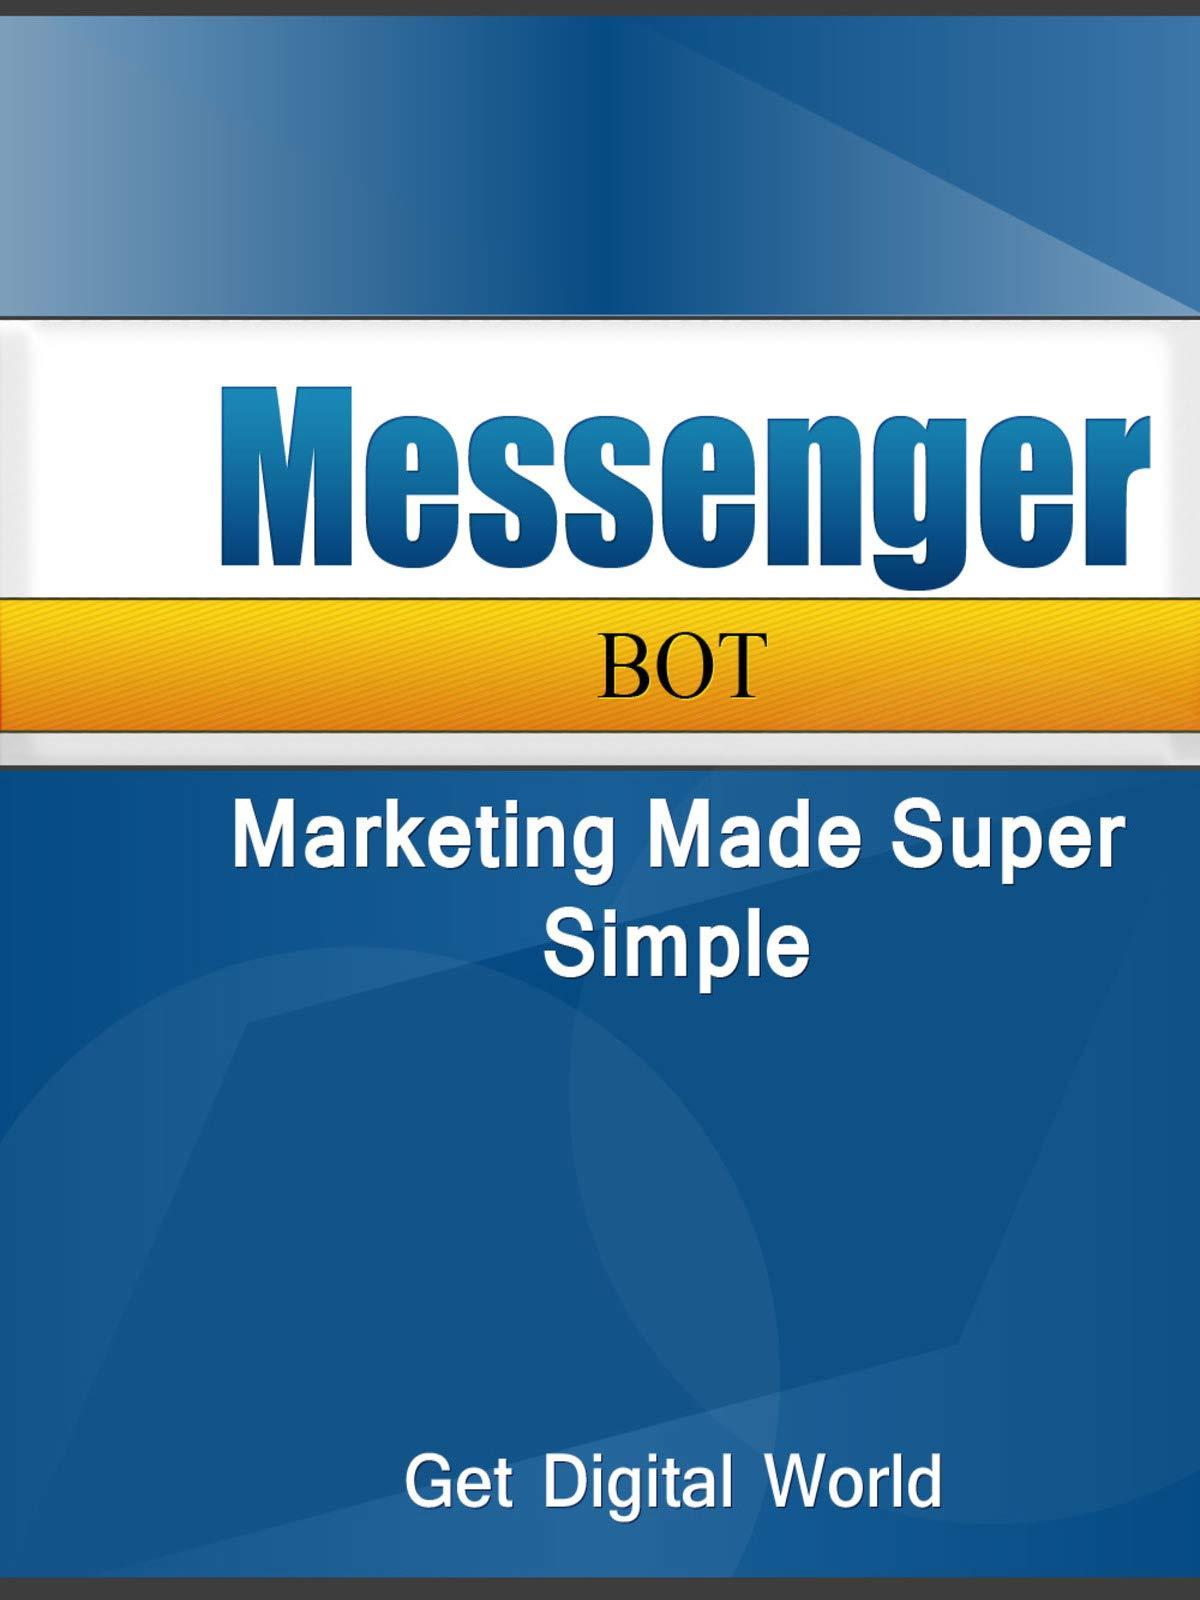 Messenger Bot Marketing Made Super Simple